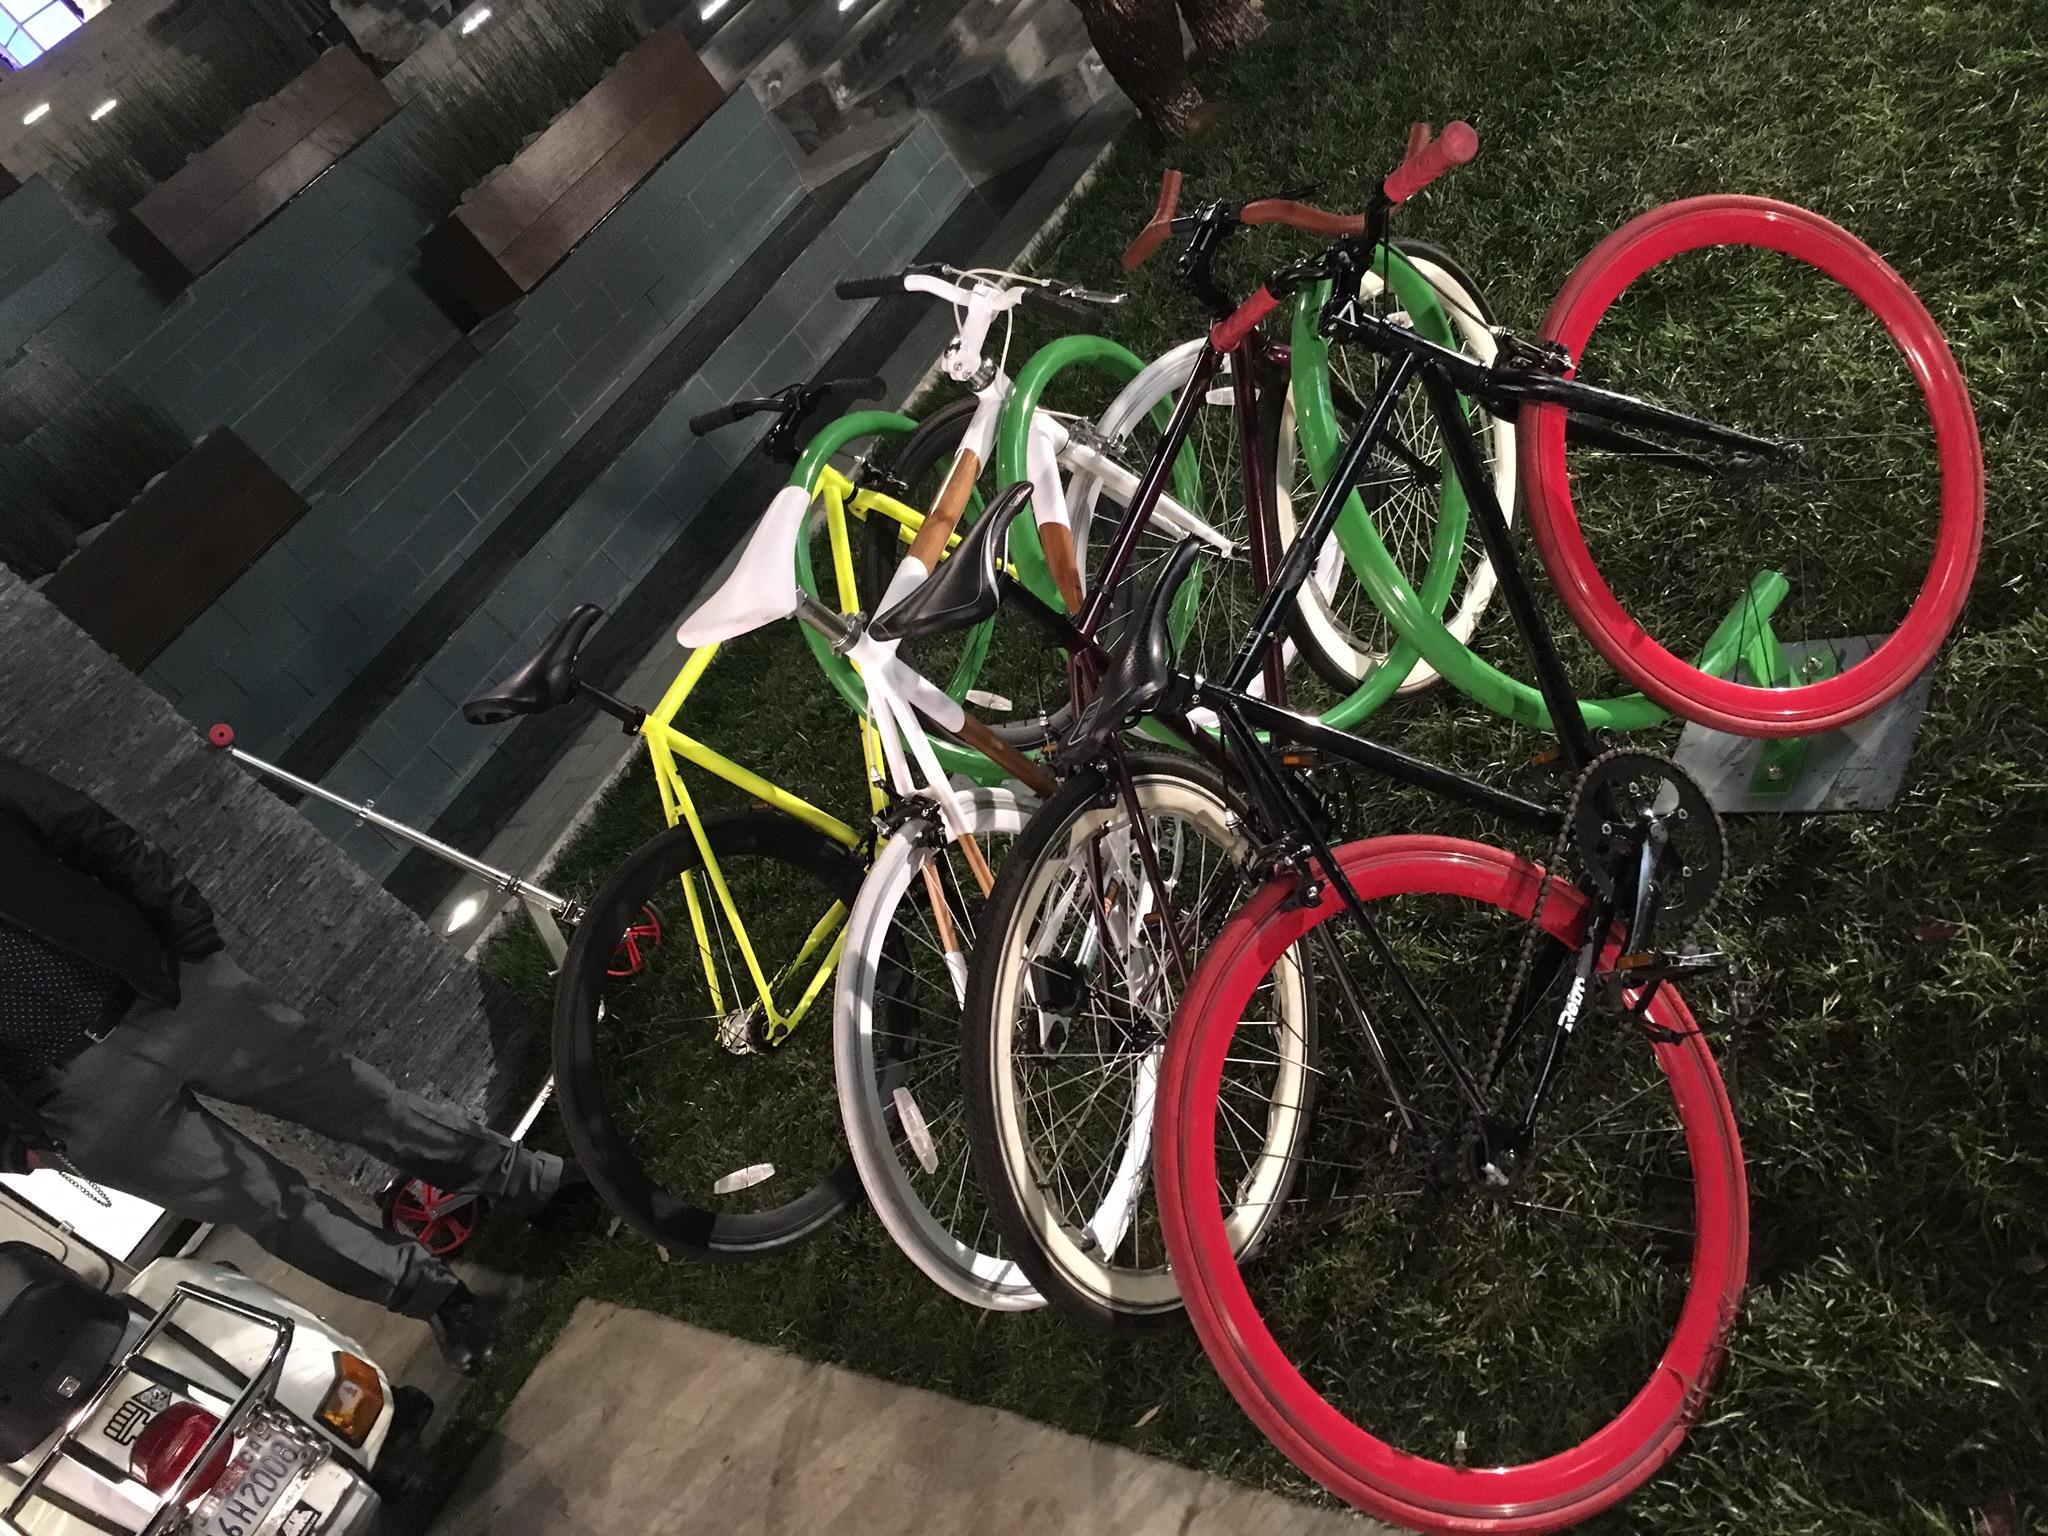 Greenstar Bikes - Why Him - Pict 2.jpg